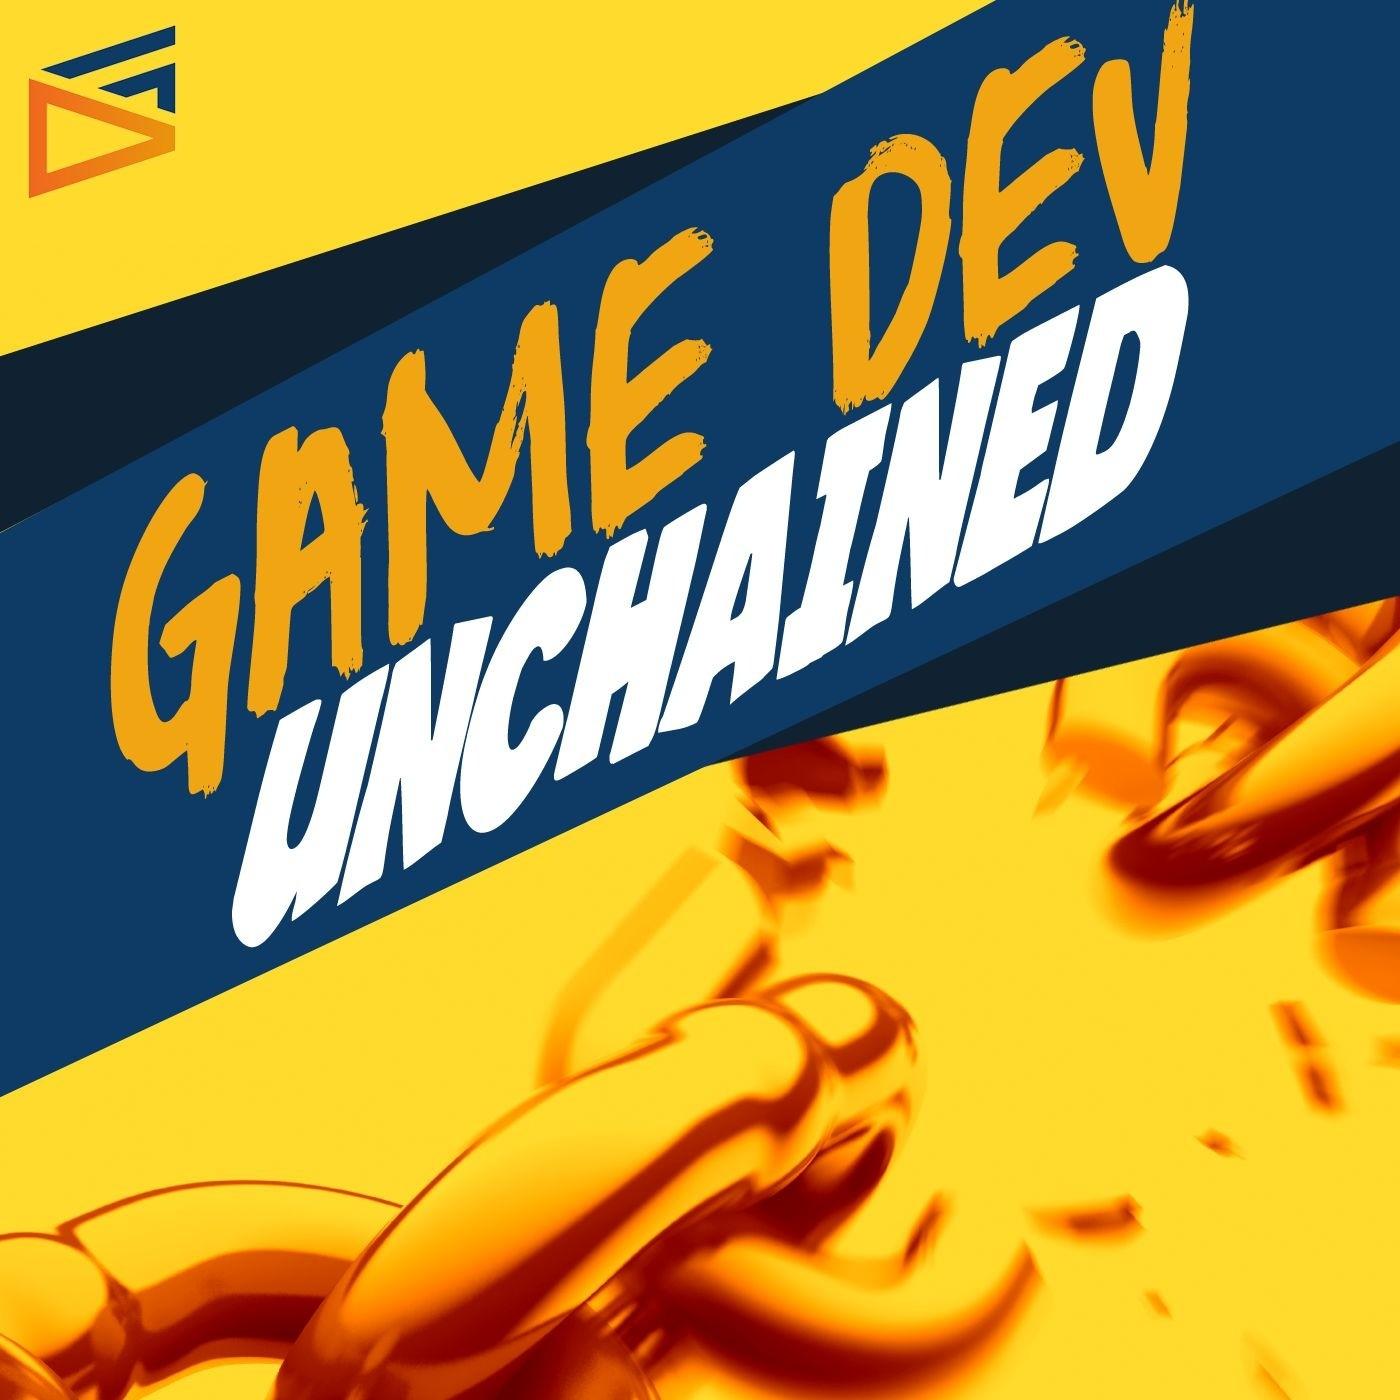 0239: Crunching with CD Projekt Red on Cyberpunk 2077